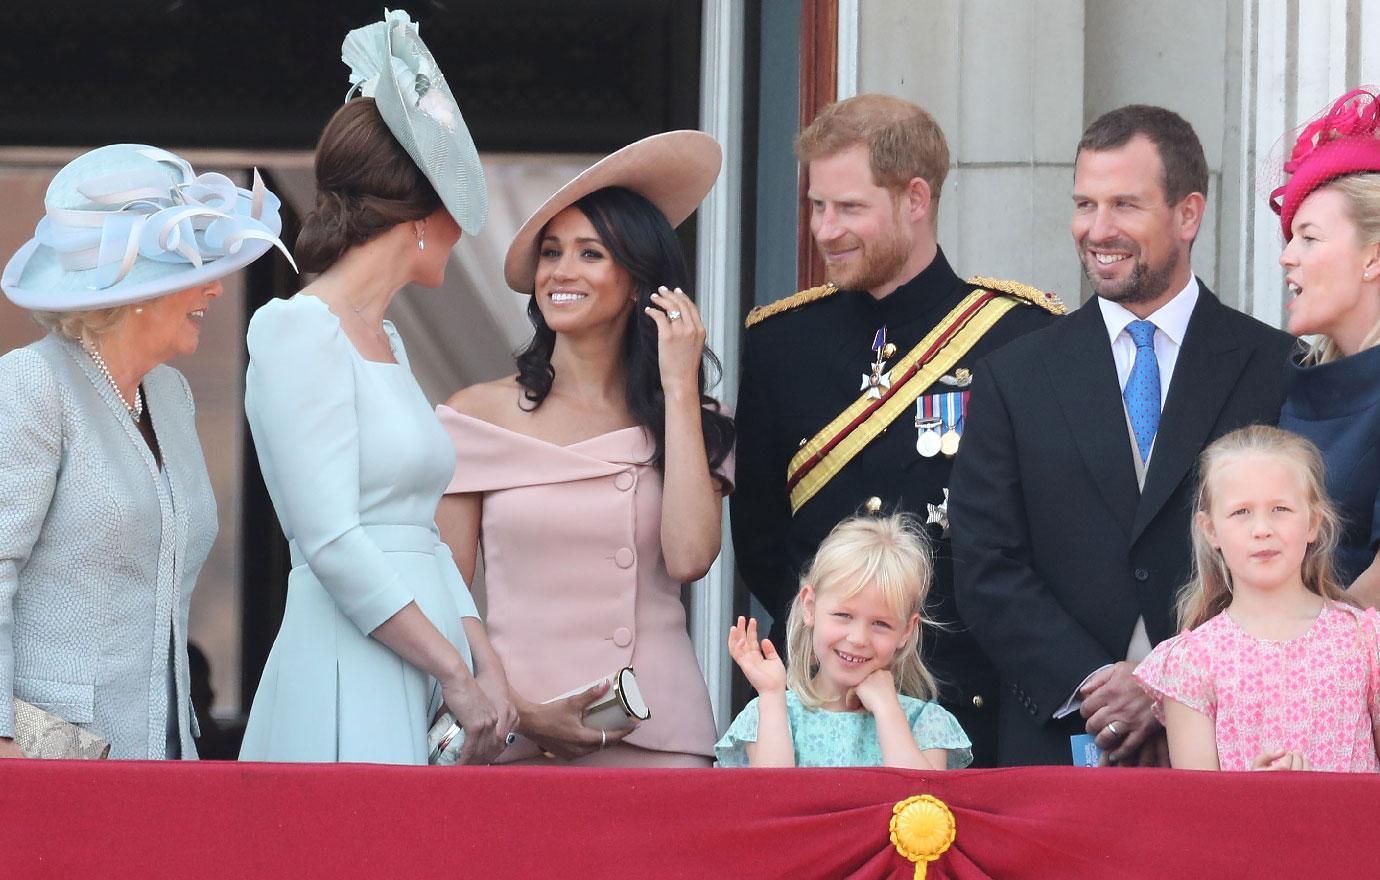 Meghan Markle Joins Royal Family At Buckingham Palace